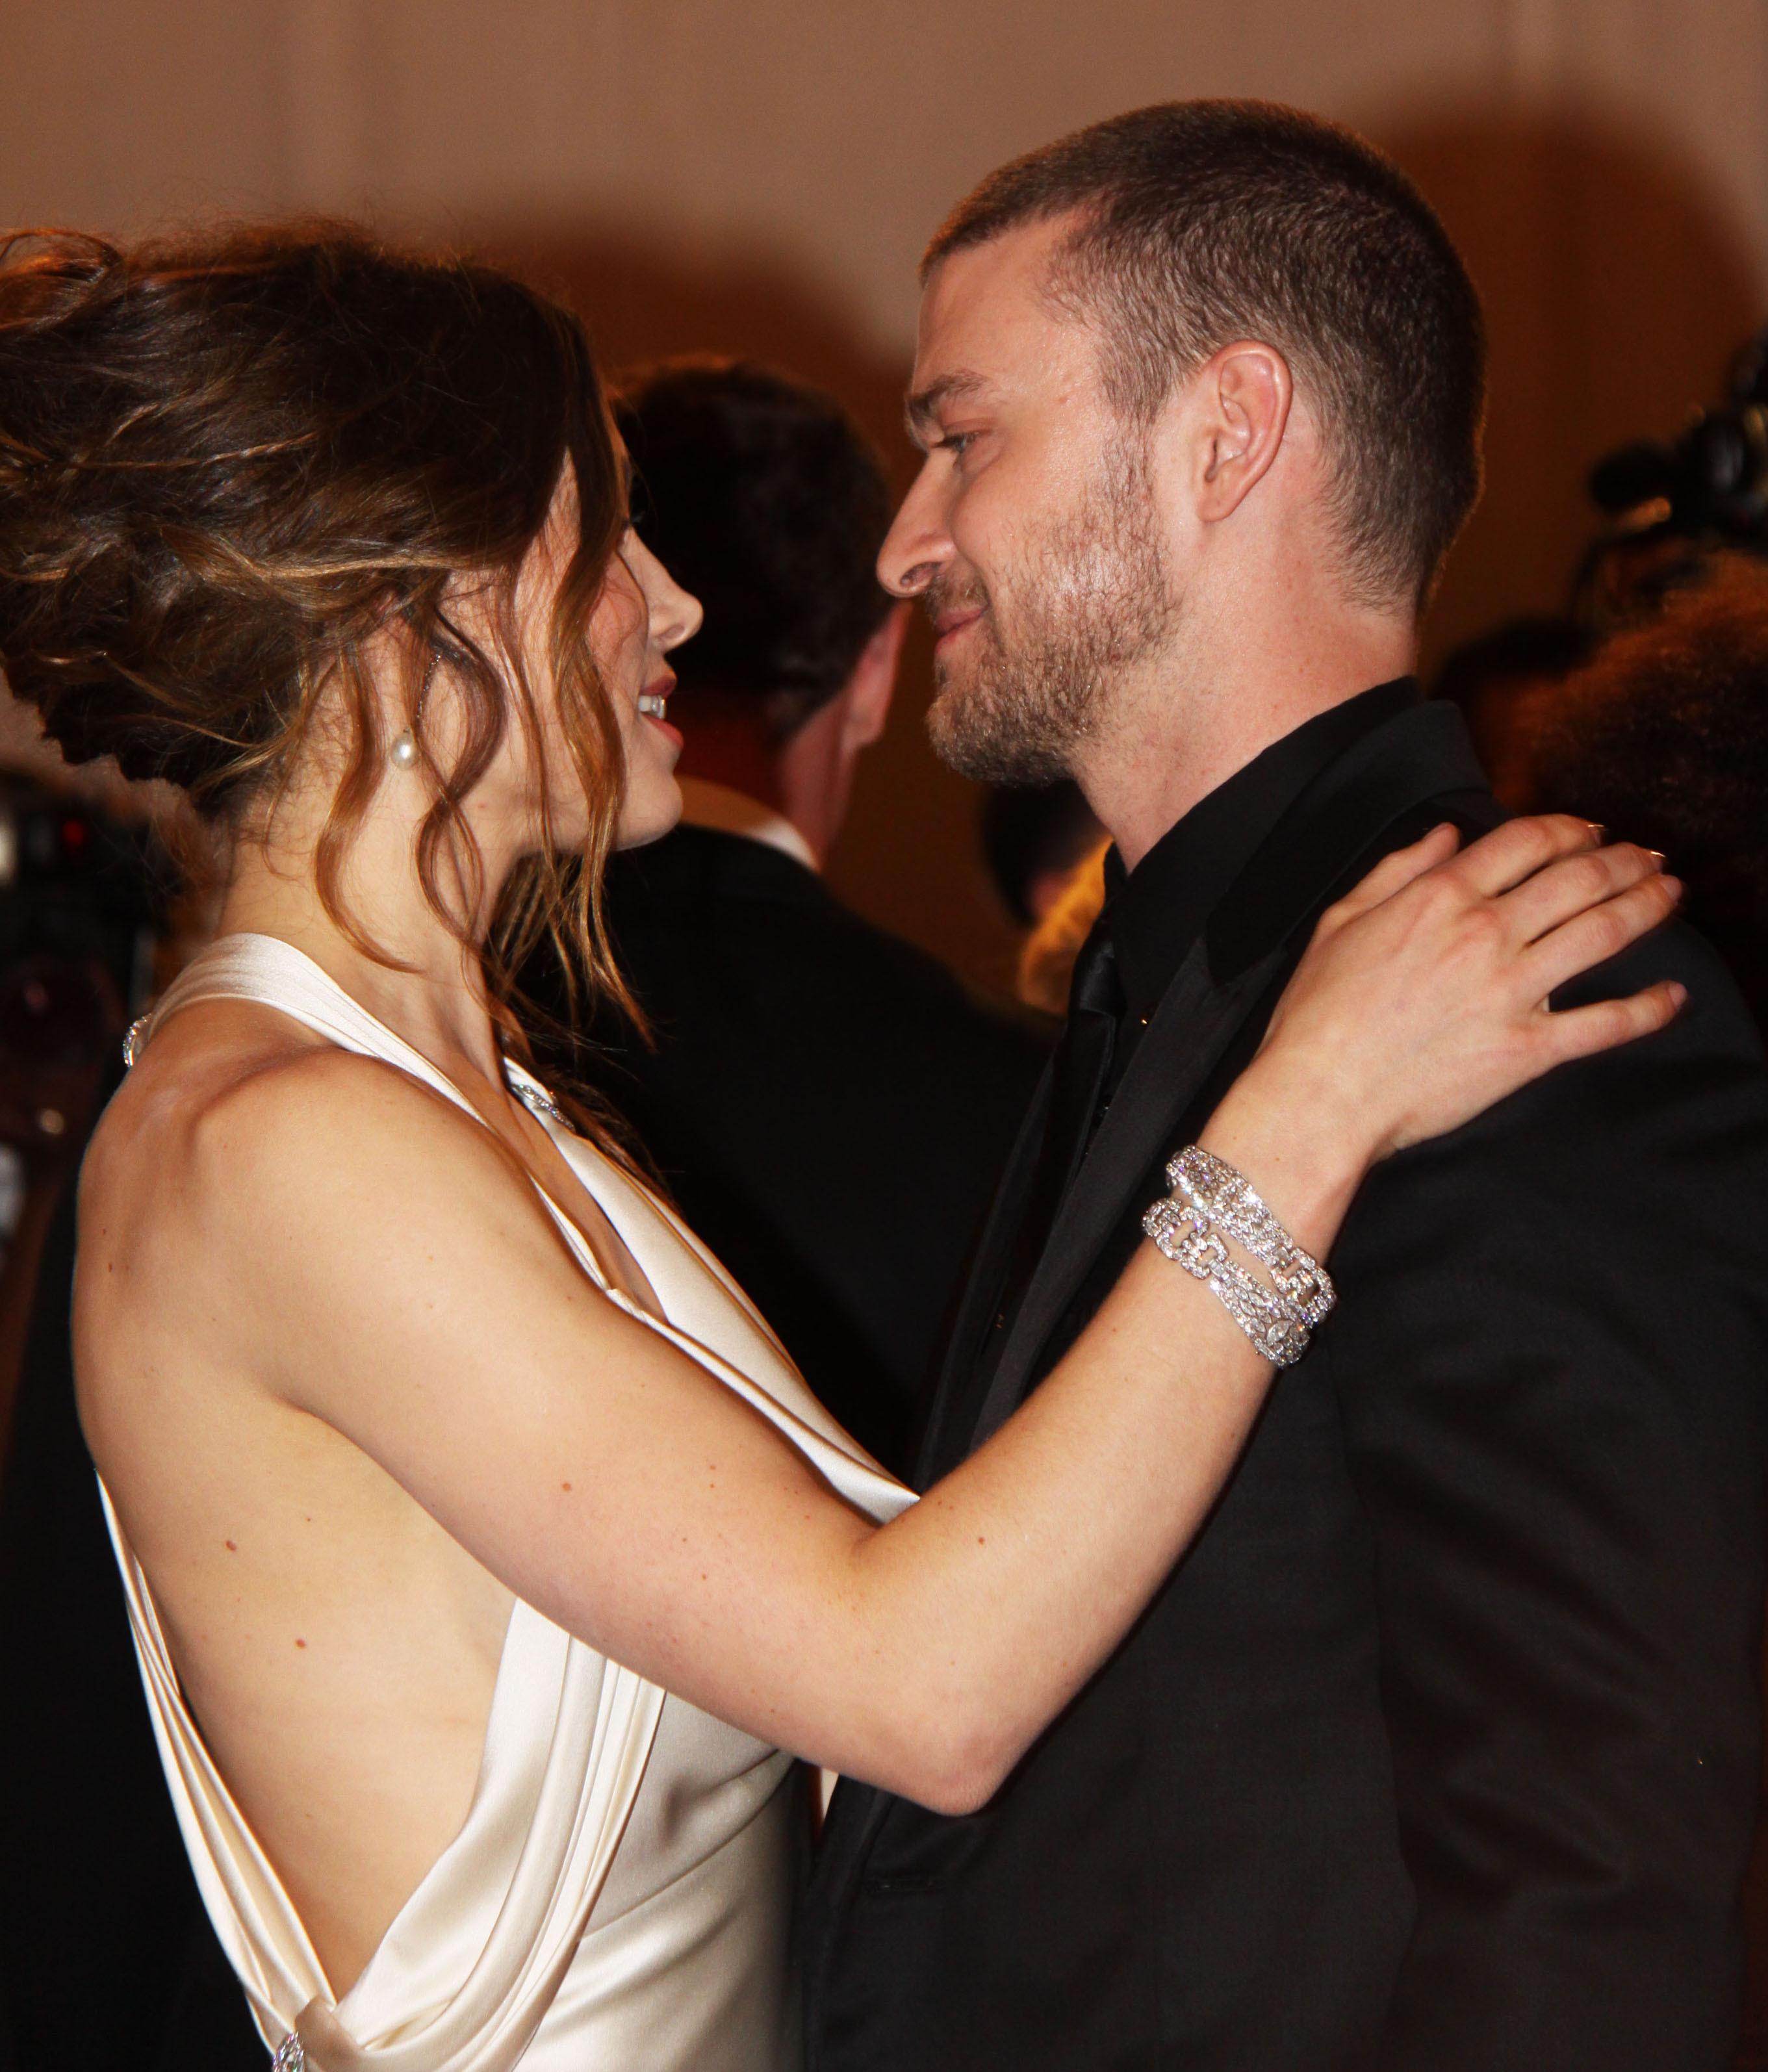 Ring Married Justin Jessica Timberlake Biel